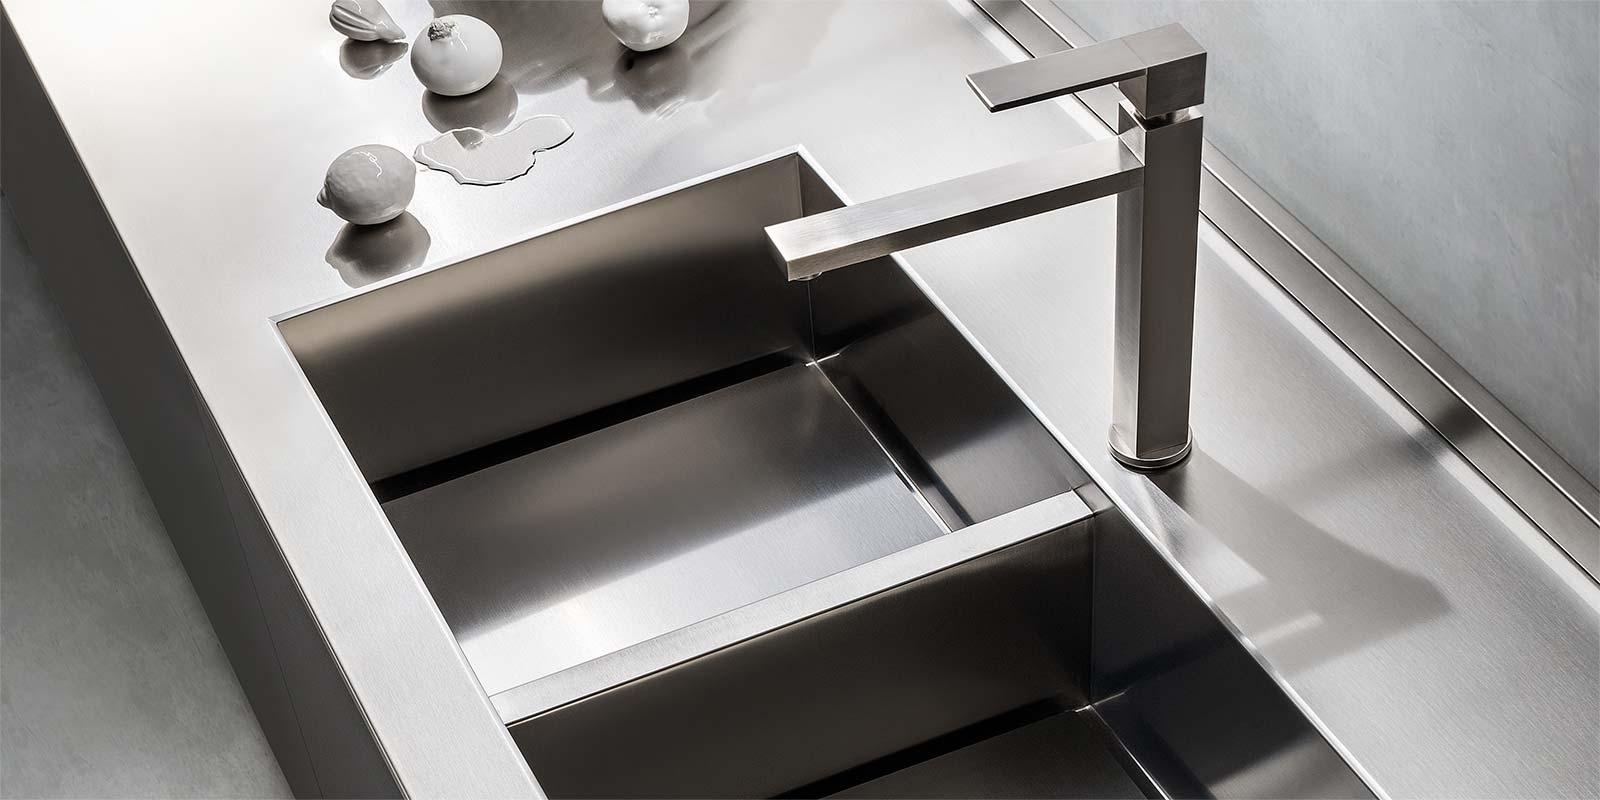 Emejing top cucina inox pictures - Piano cucina acciaio ...